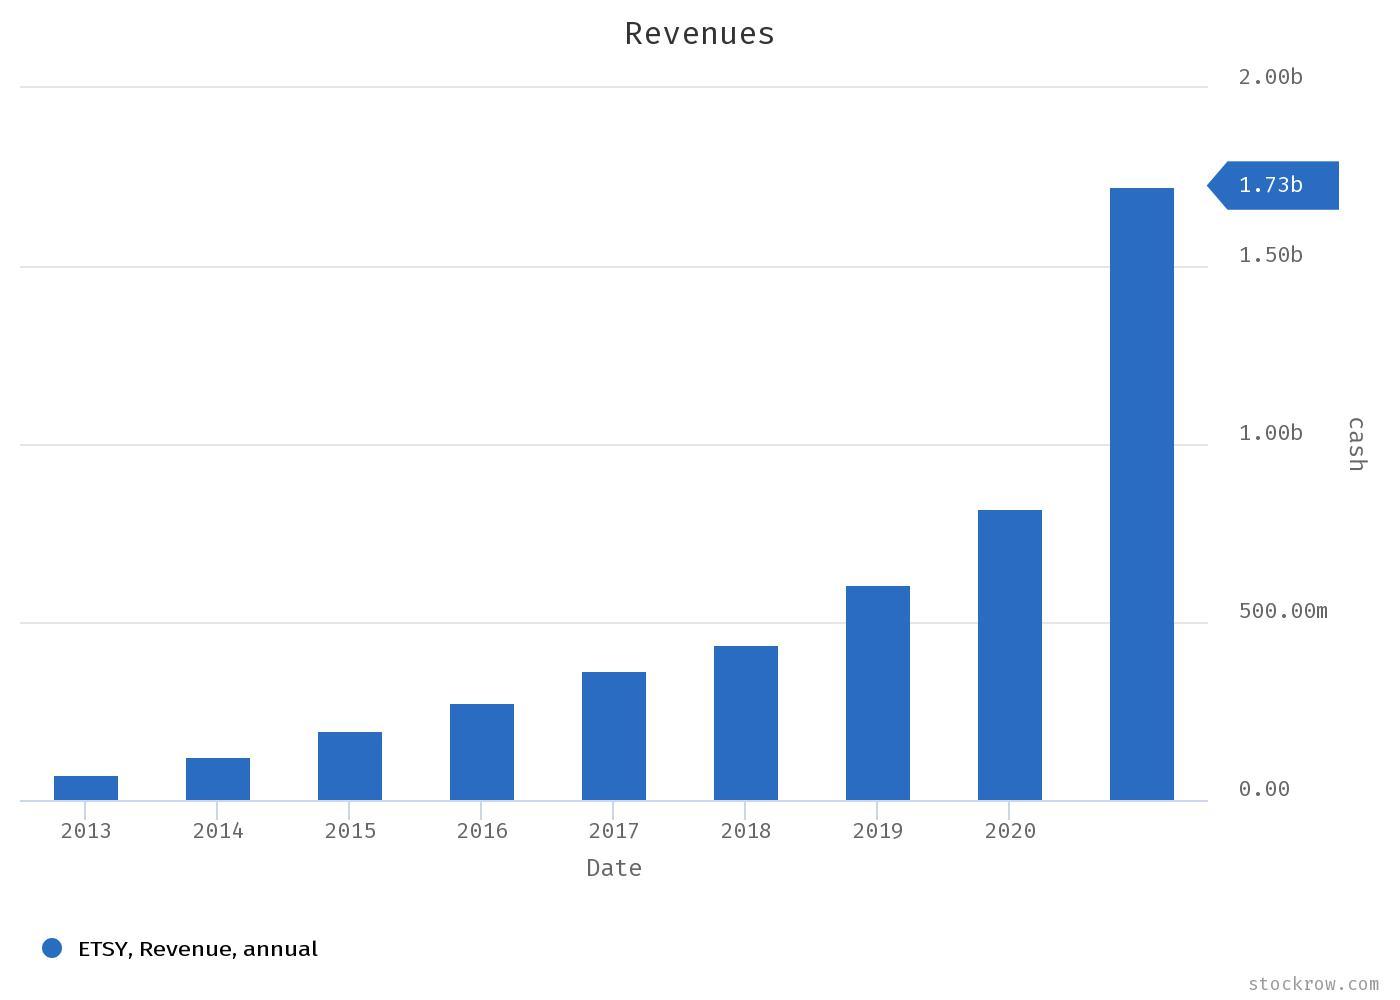 Etsy Stock Forecast Revenues Snapshot